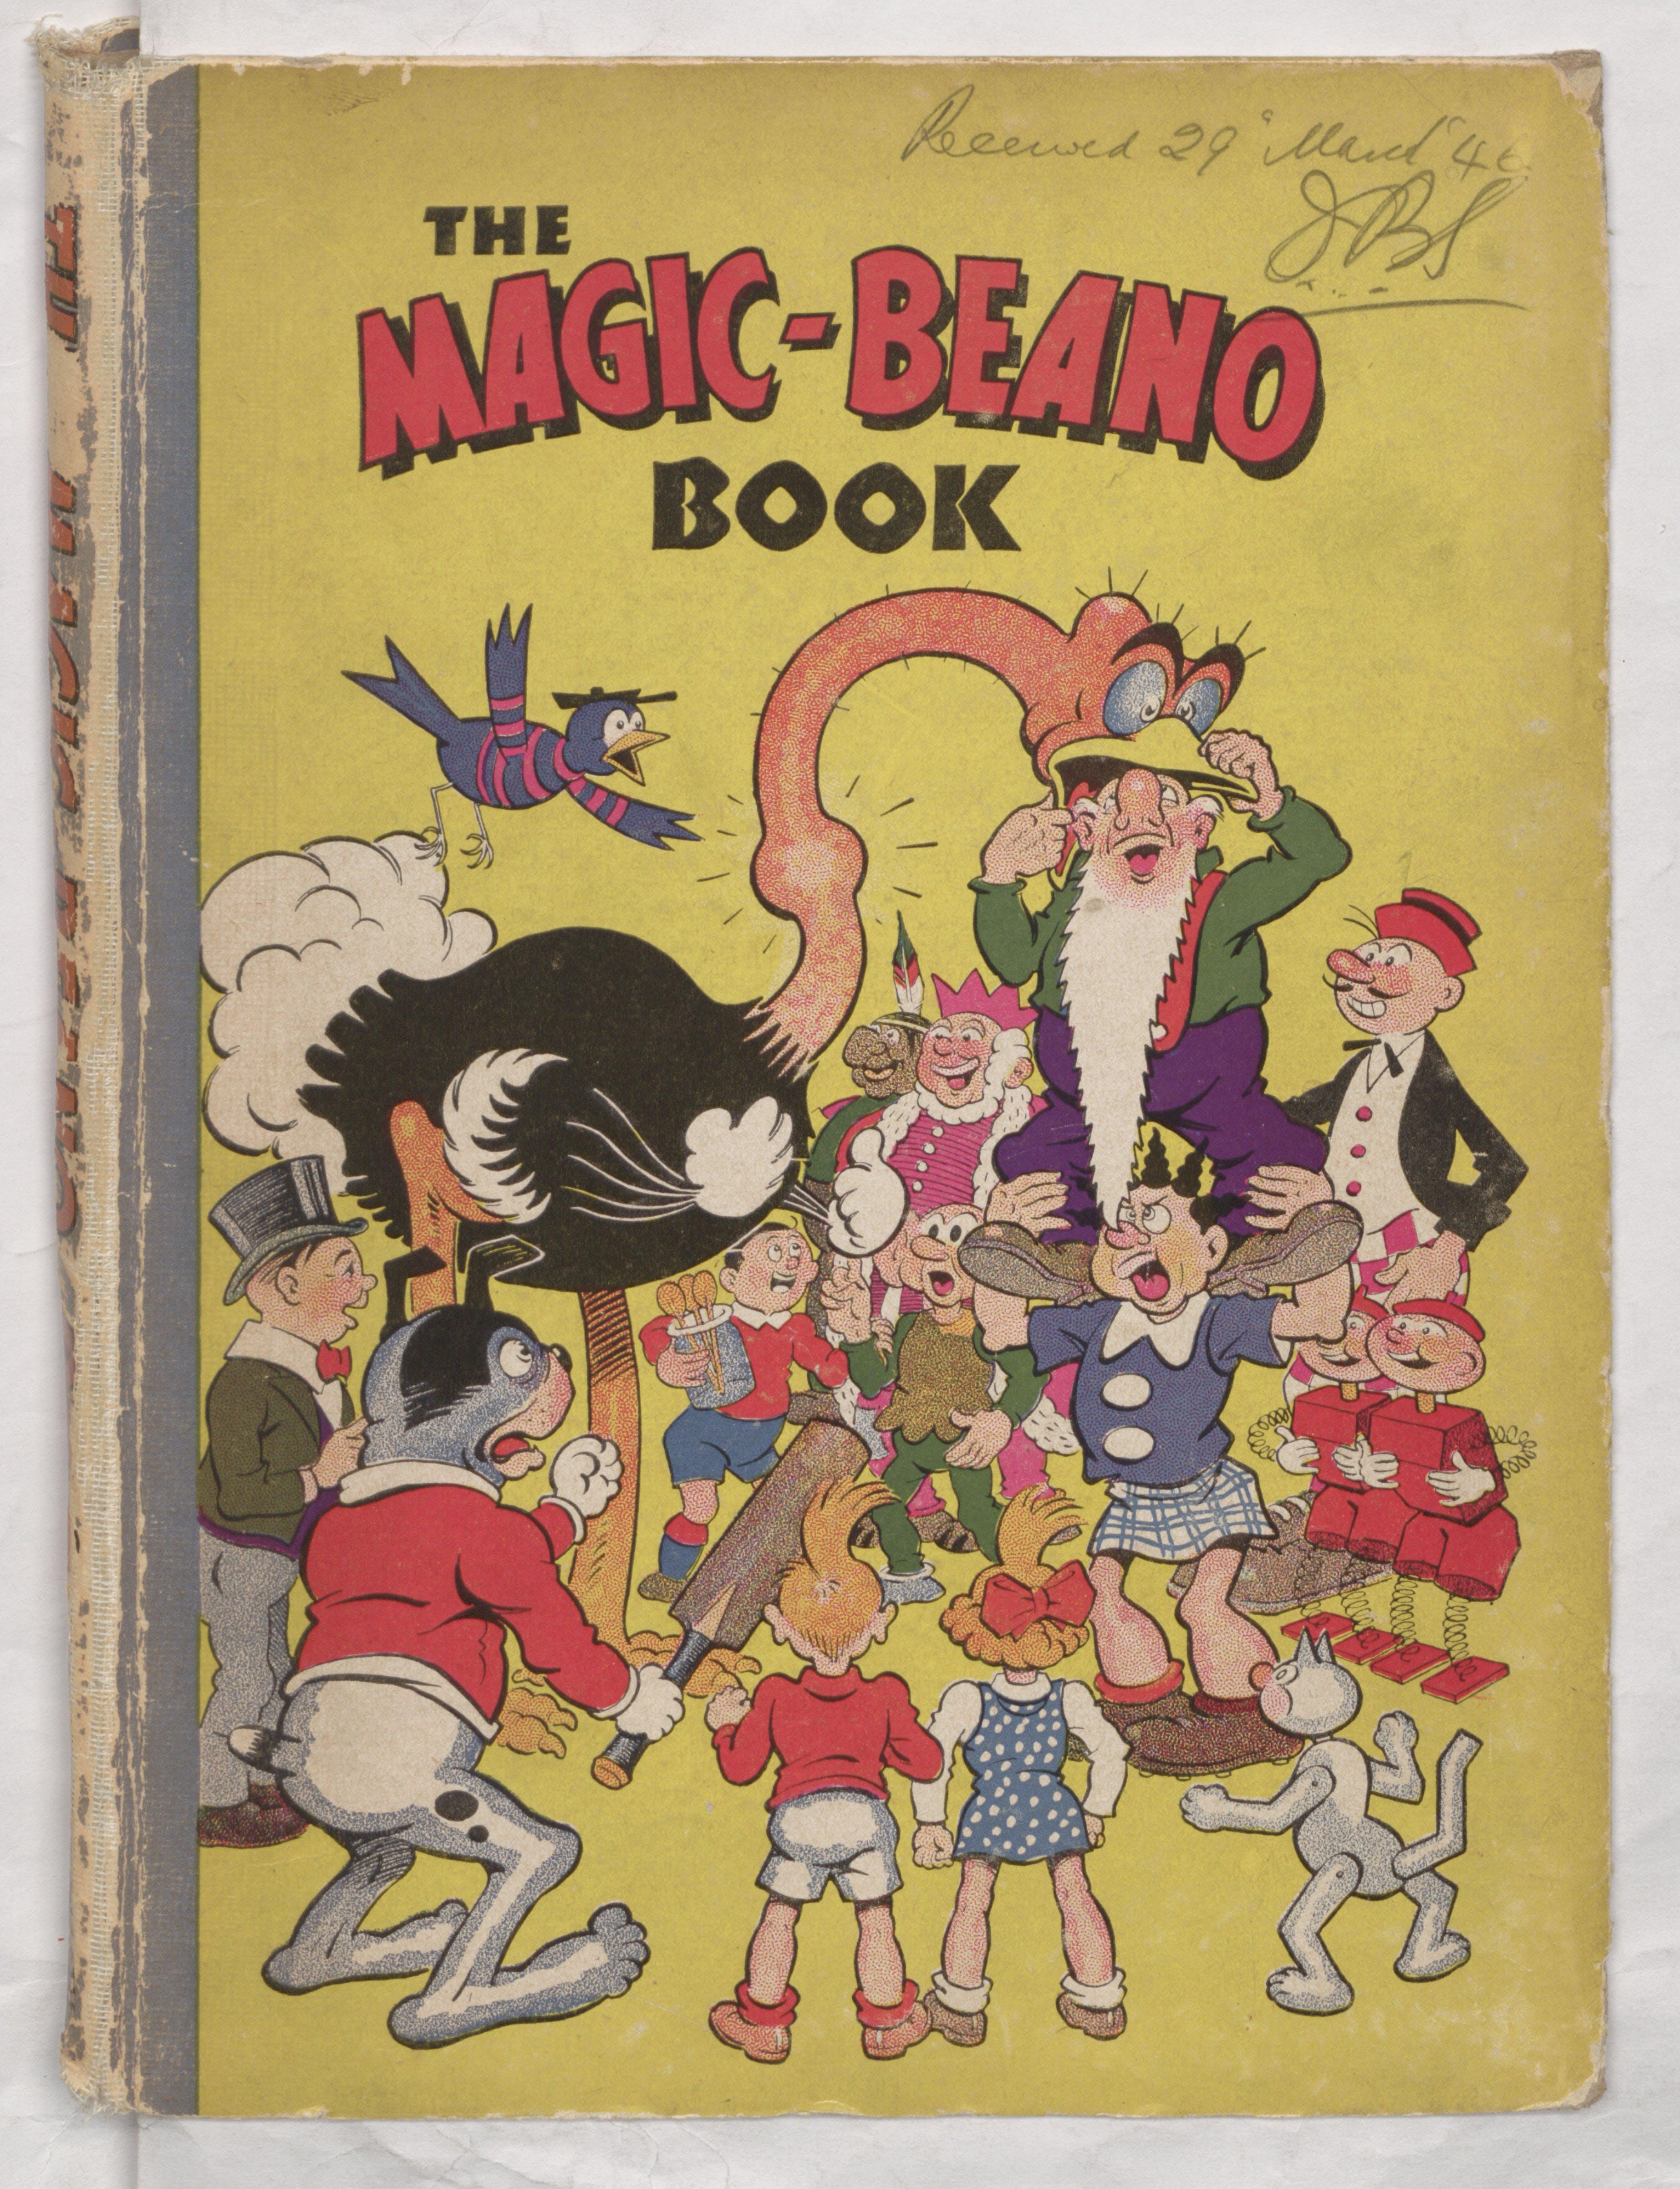 1947 Magic-Beano Book - Annual Cover